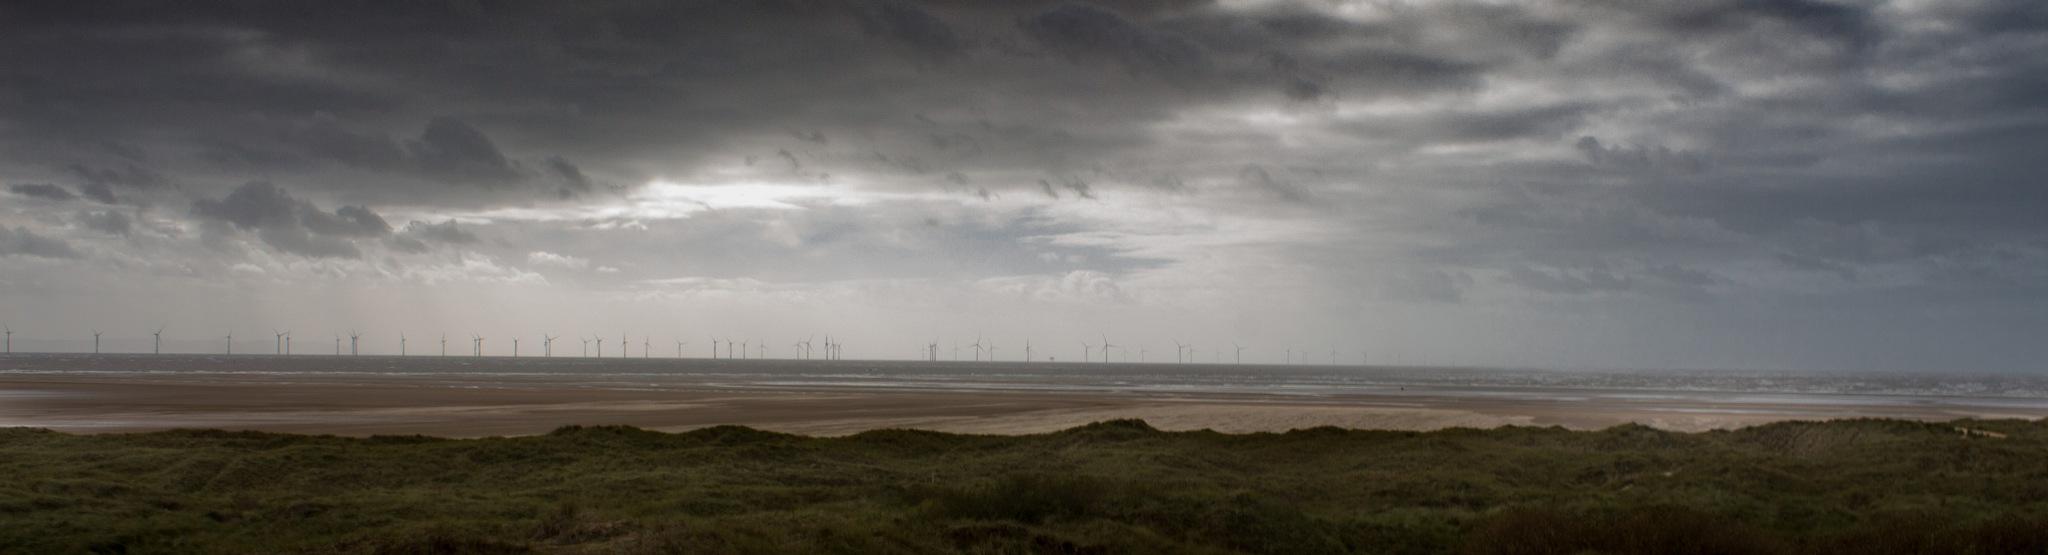 Stormy by Luke Nield